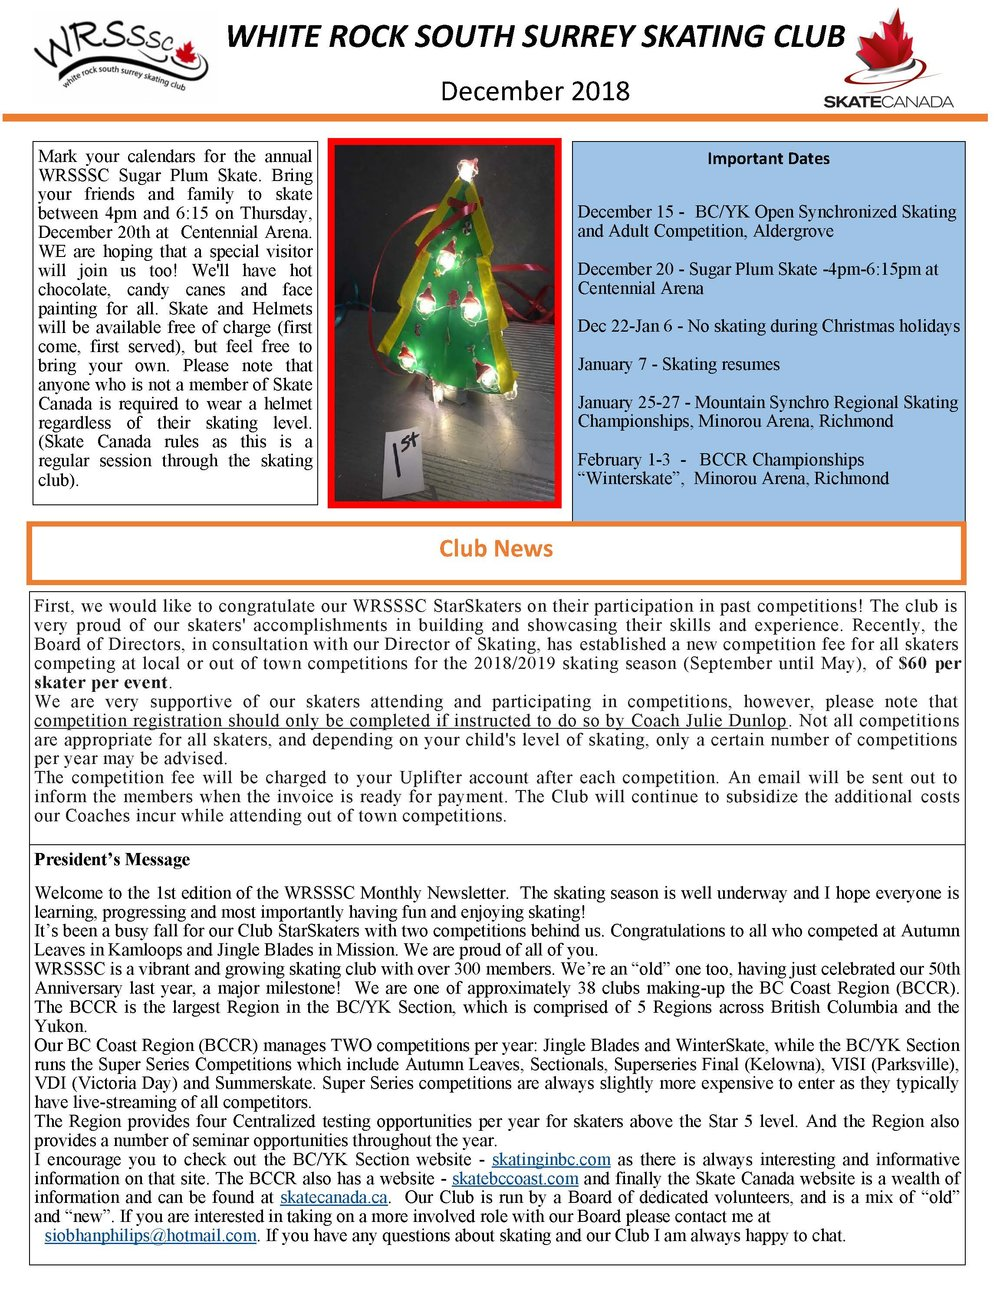 WRSSSC Newsletter December 2018_Page_1.jpg